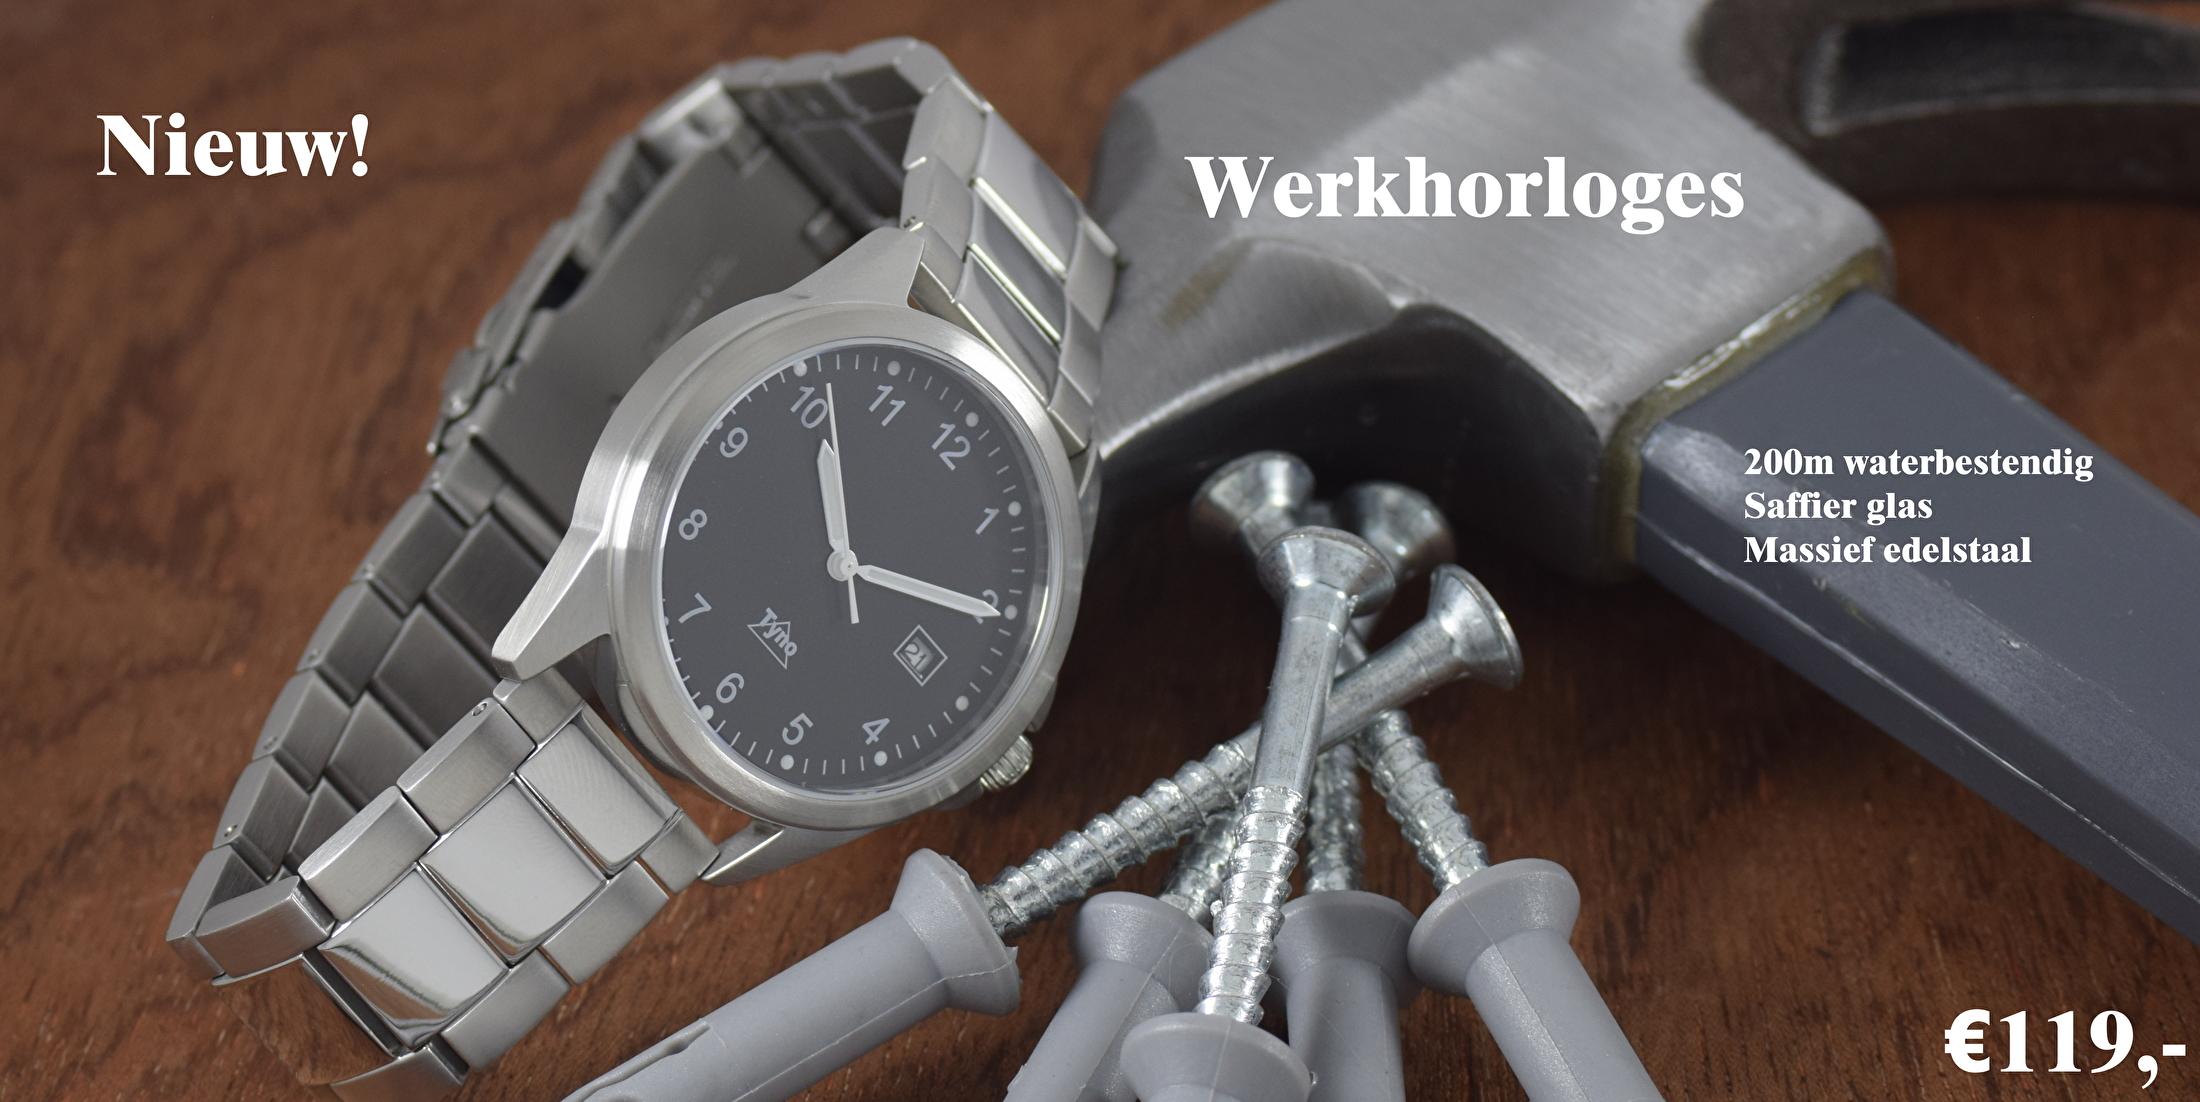 Tyno 201-011 Werkhorloges